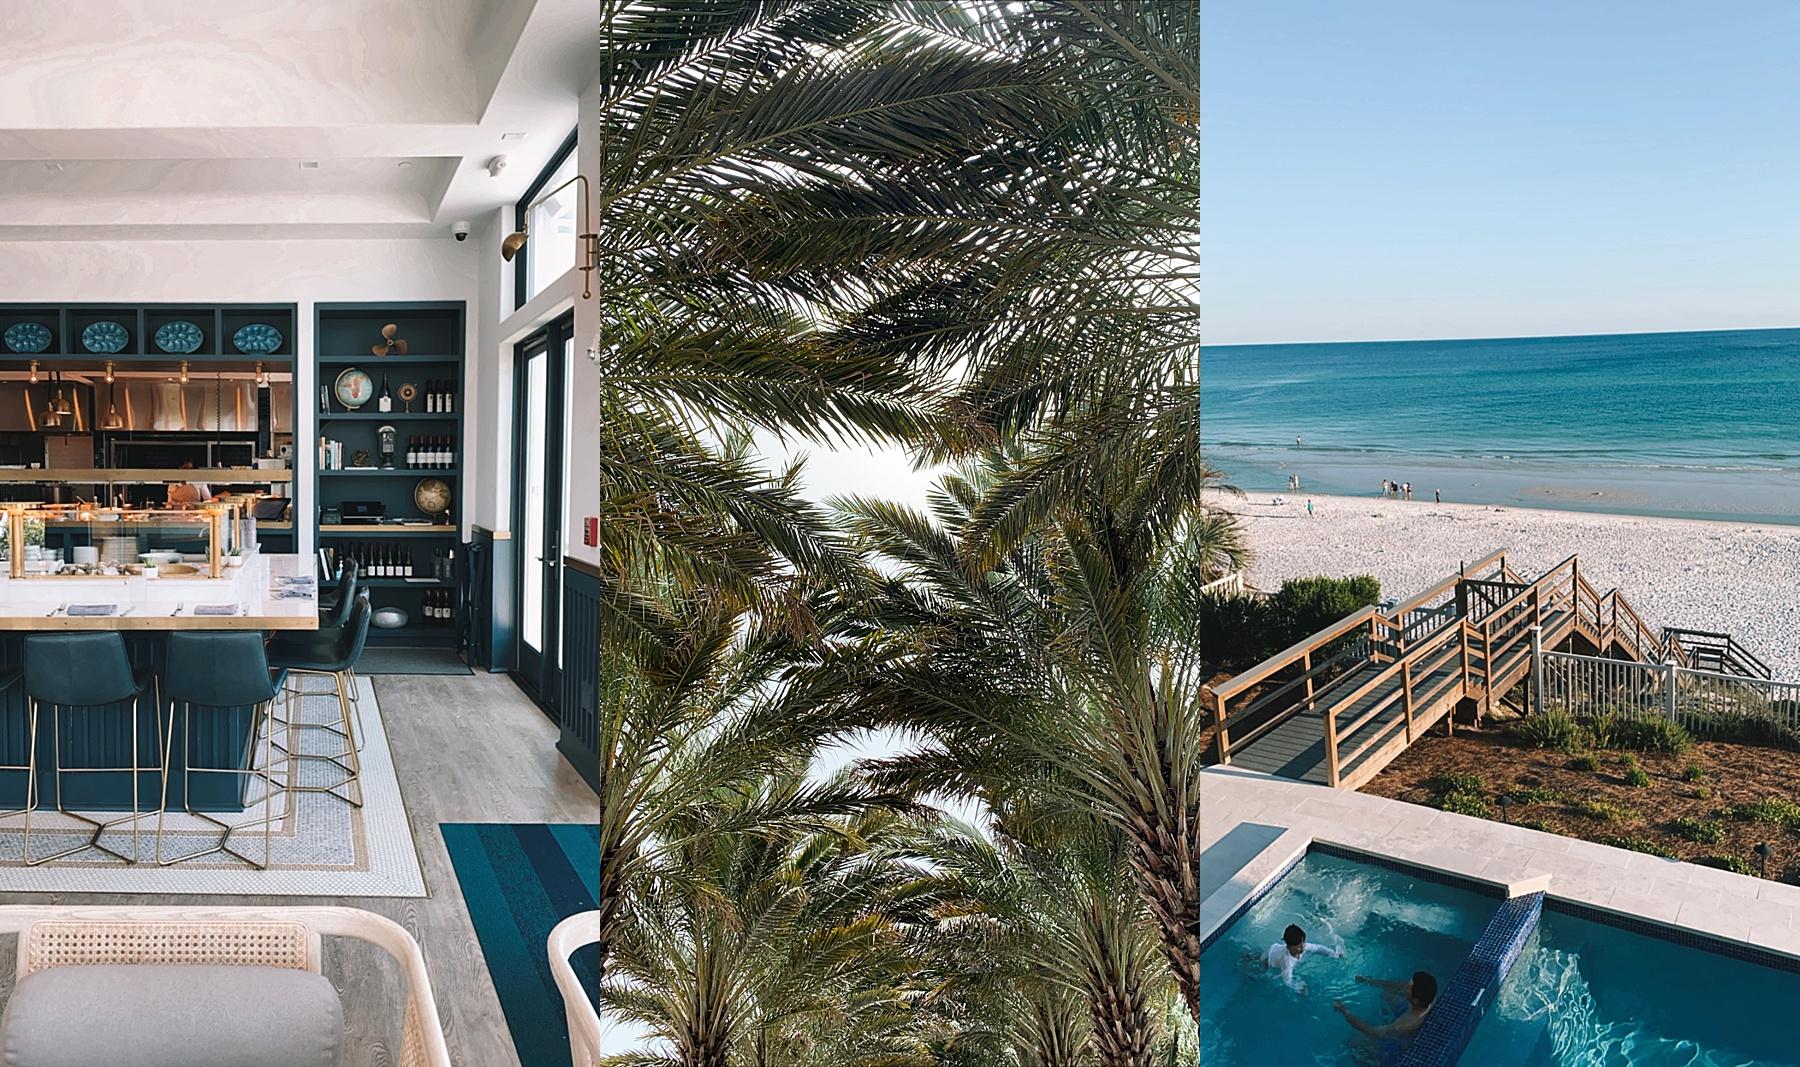 John Philp Thompson Florida 30A Travel Blogger Influencer